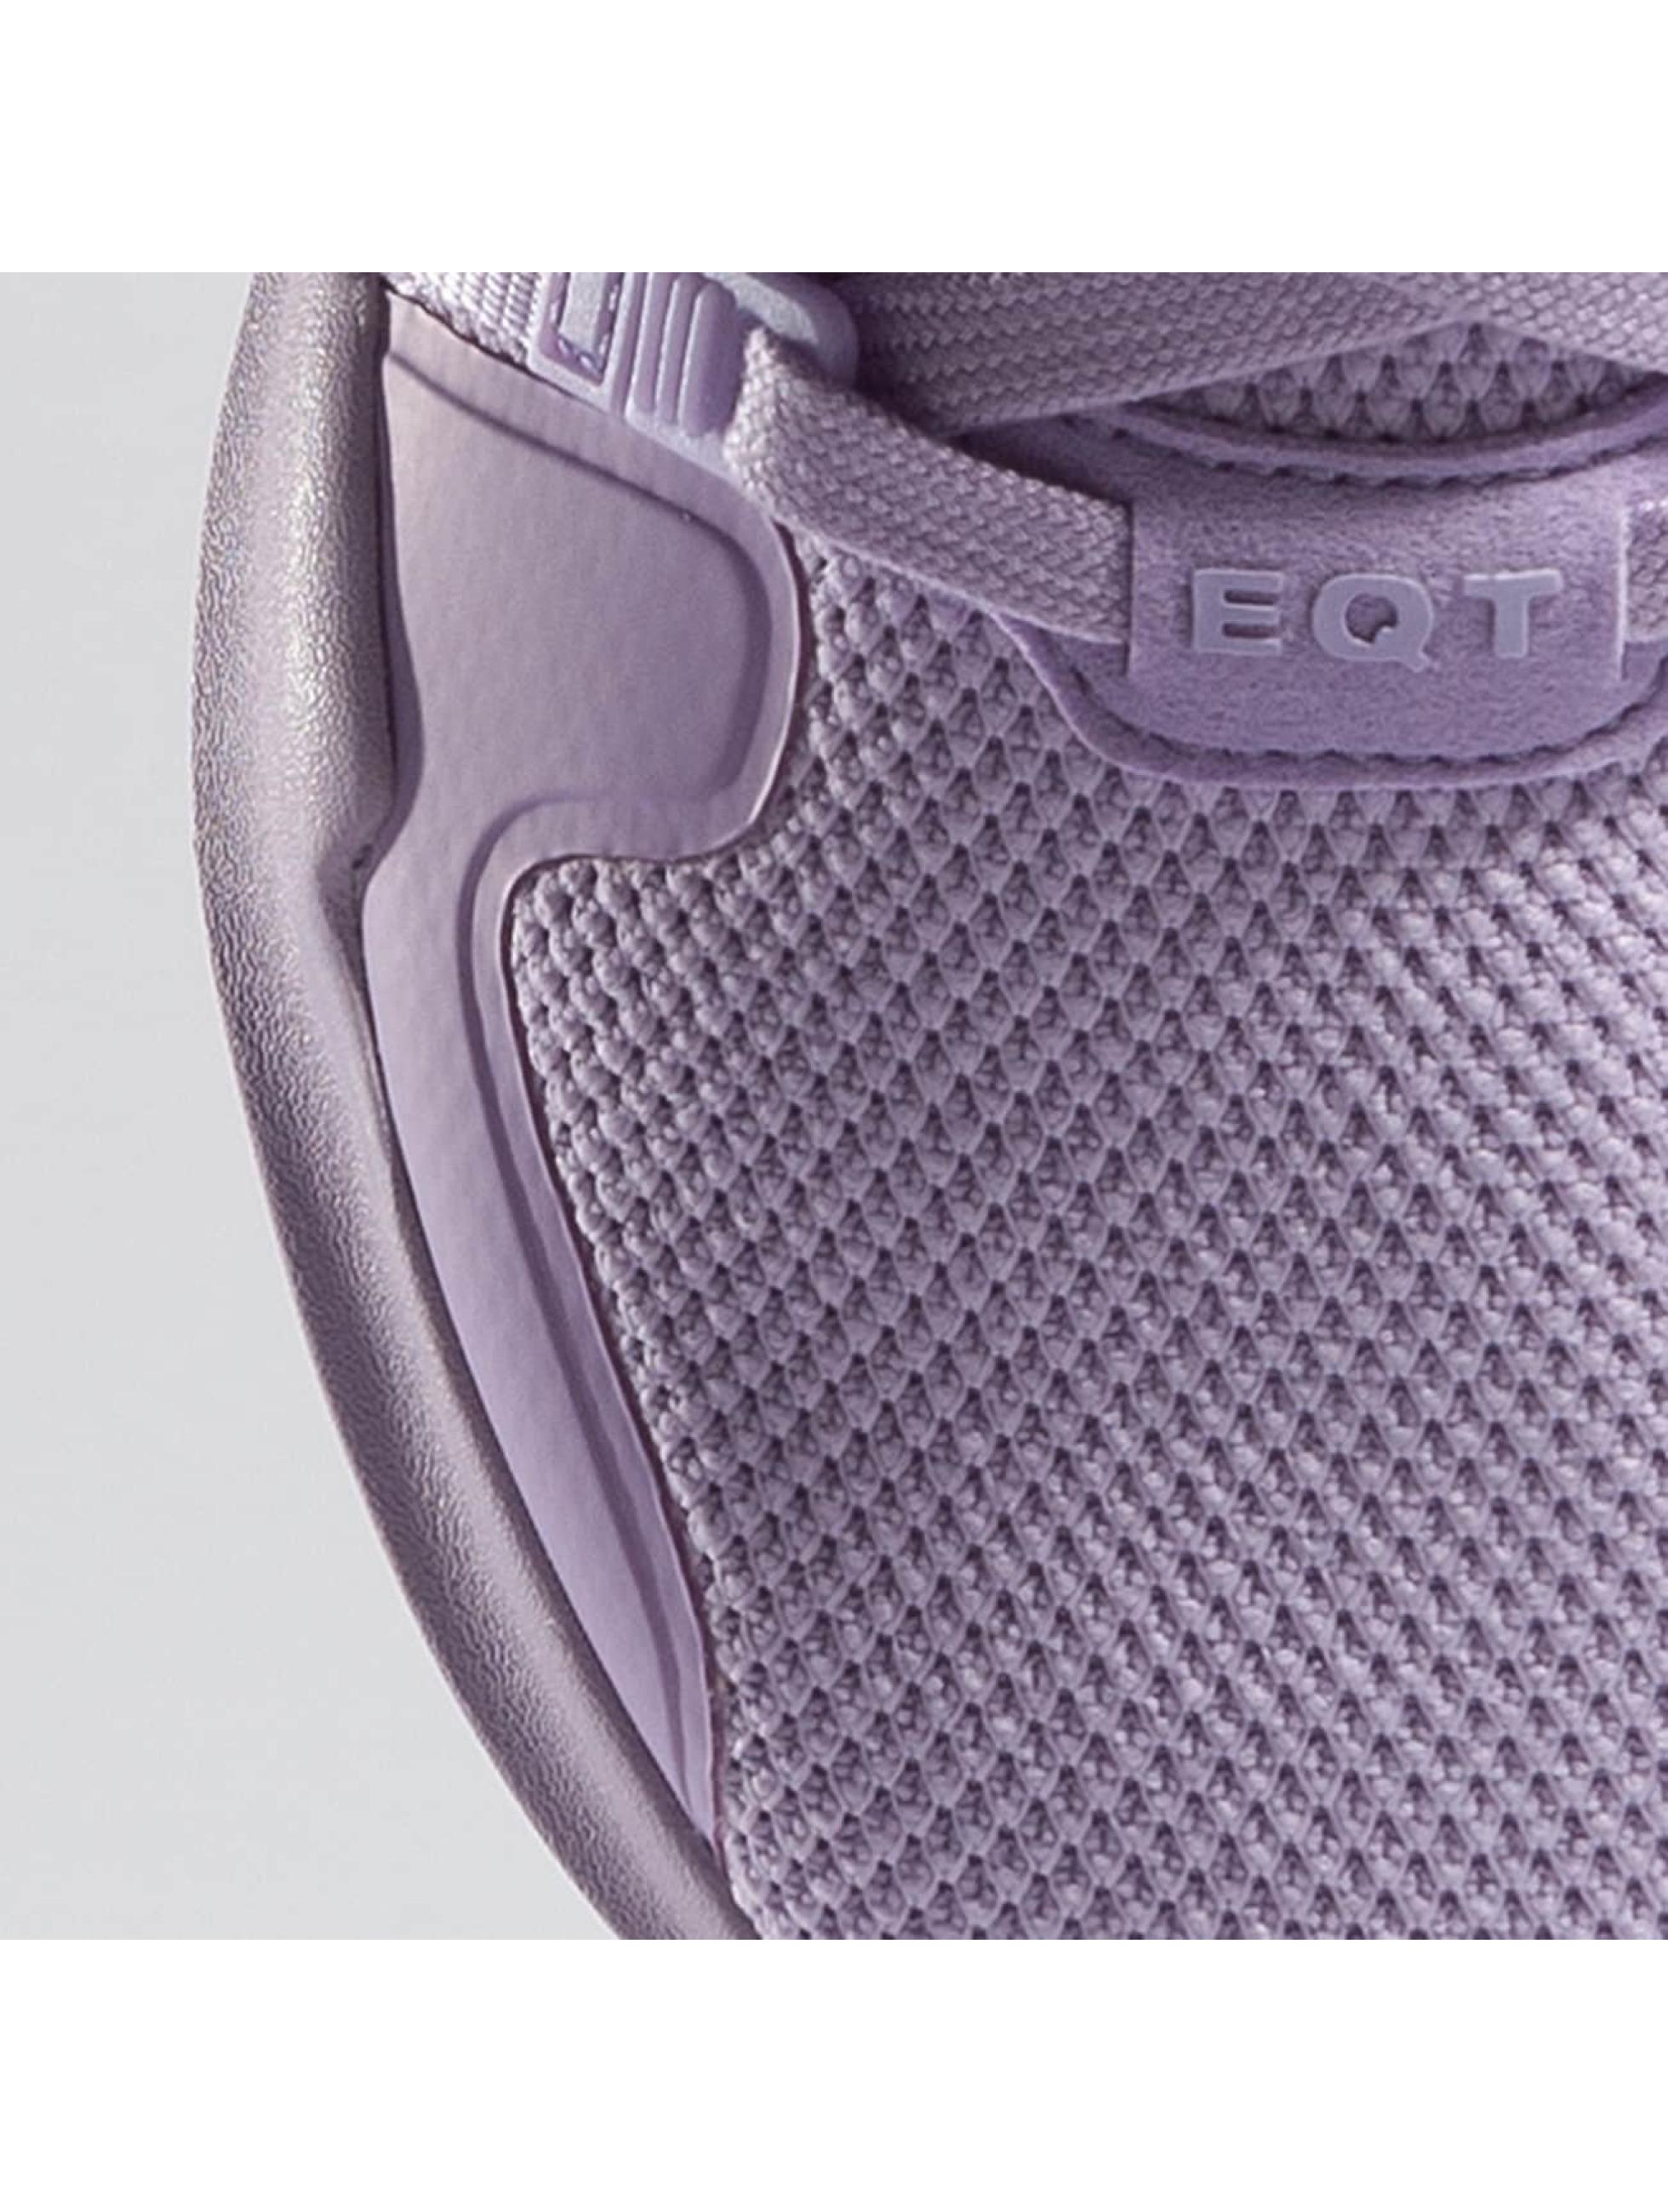 adidas Sneakers Equipment Support ADV purple